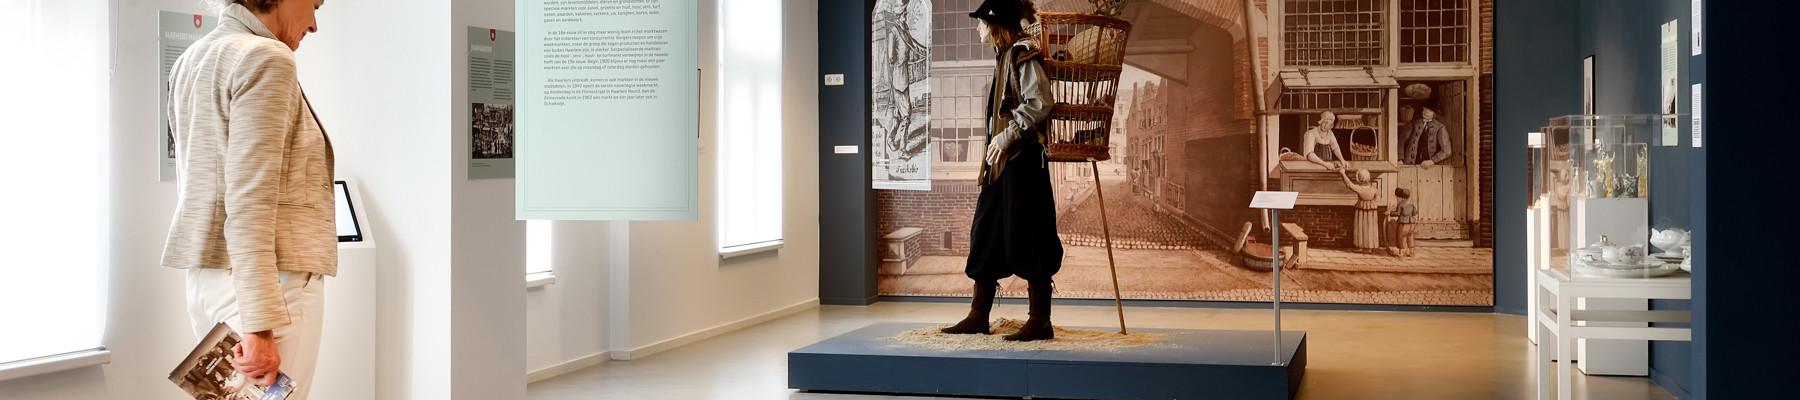 Synergique_Tentoonstelling_Museum Haarlem_01-1